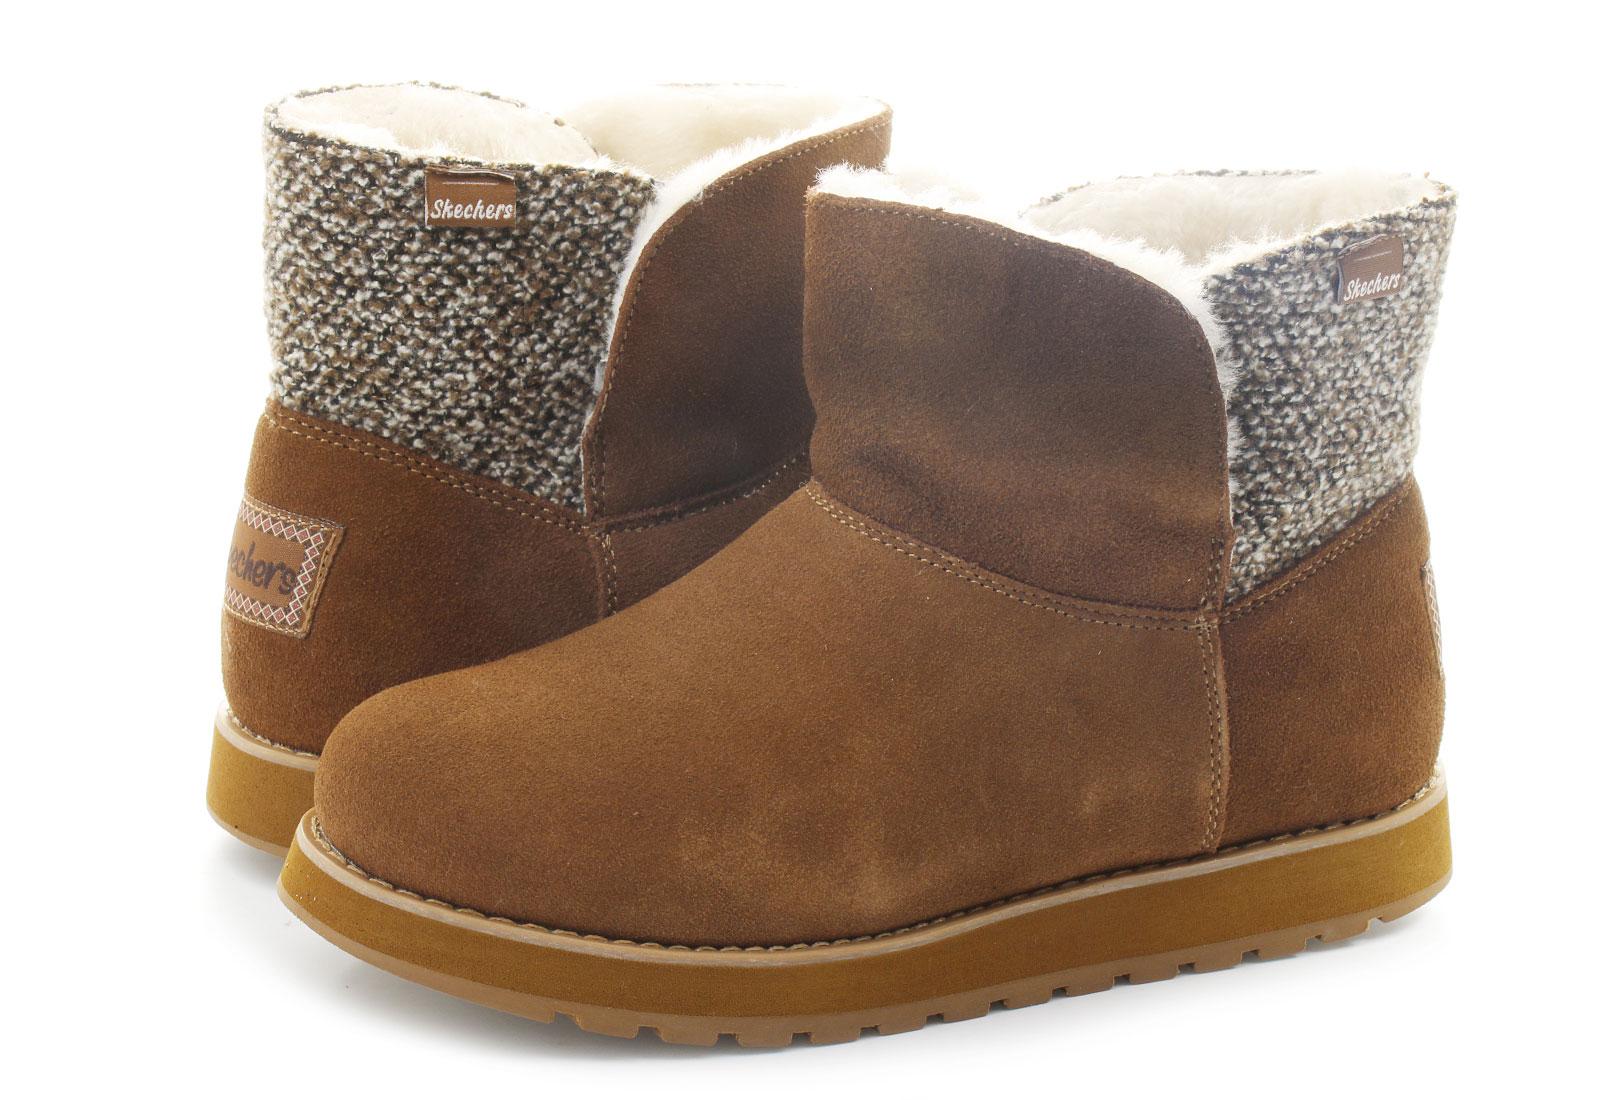 Skechers Csizma - Keepsakes - Peekaboo - 48803-csnt - Office Shoes ... 89195474a2